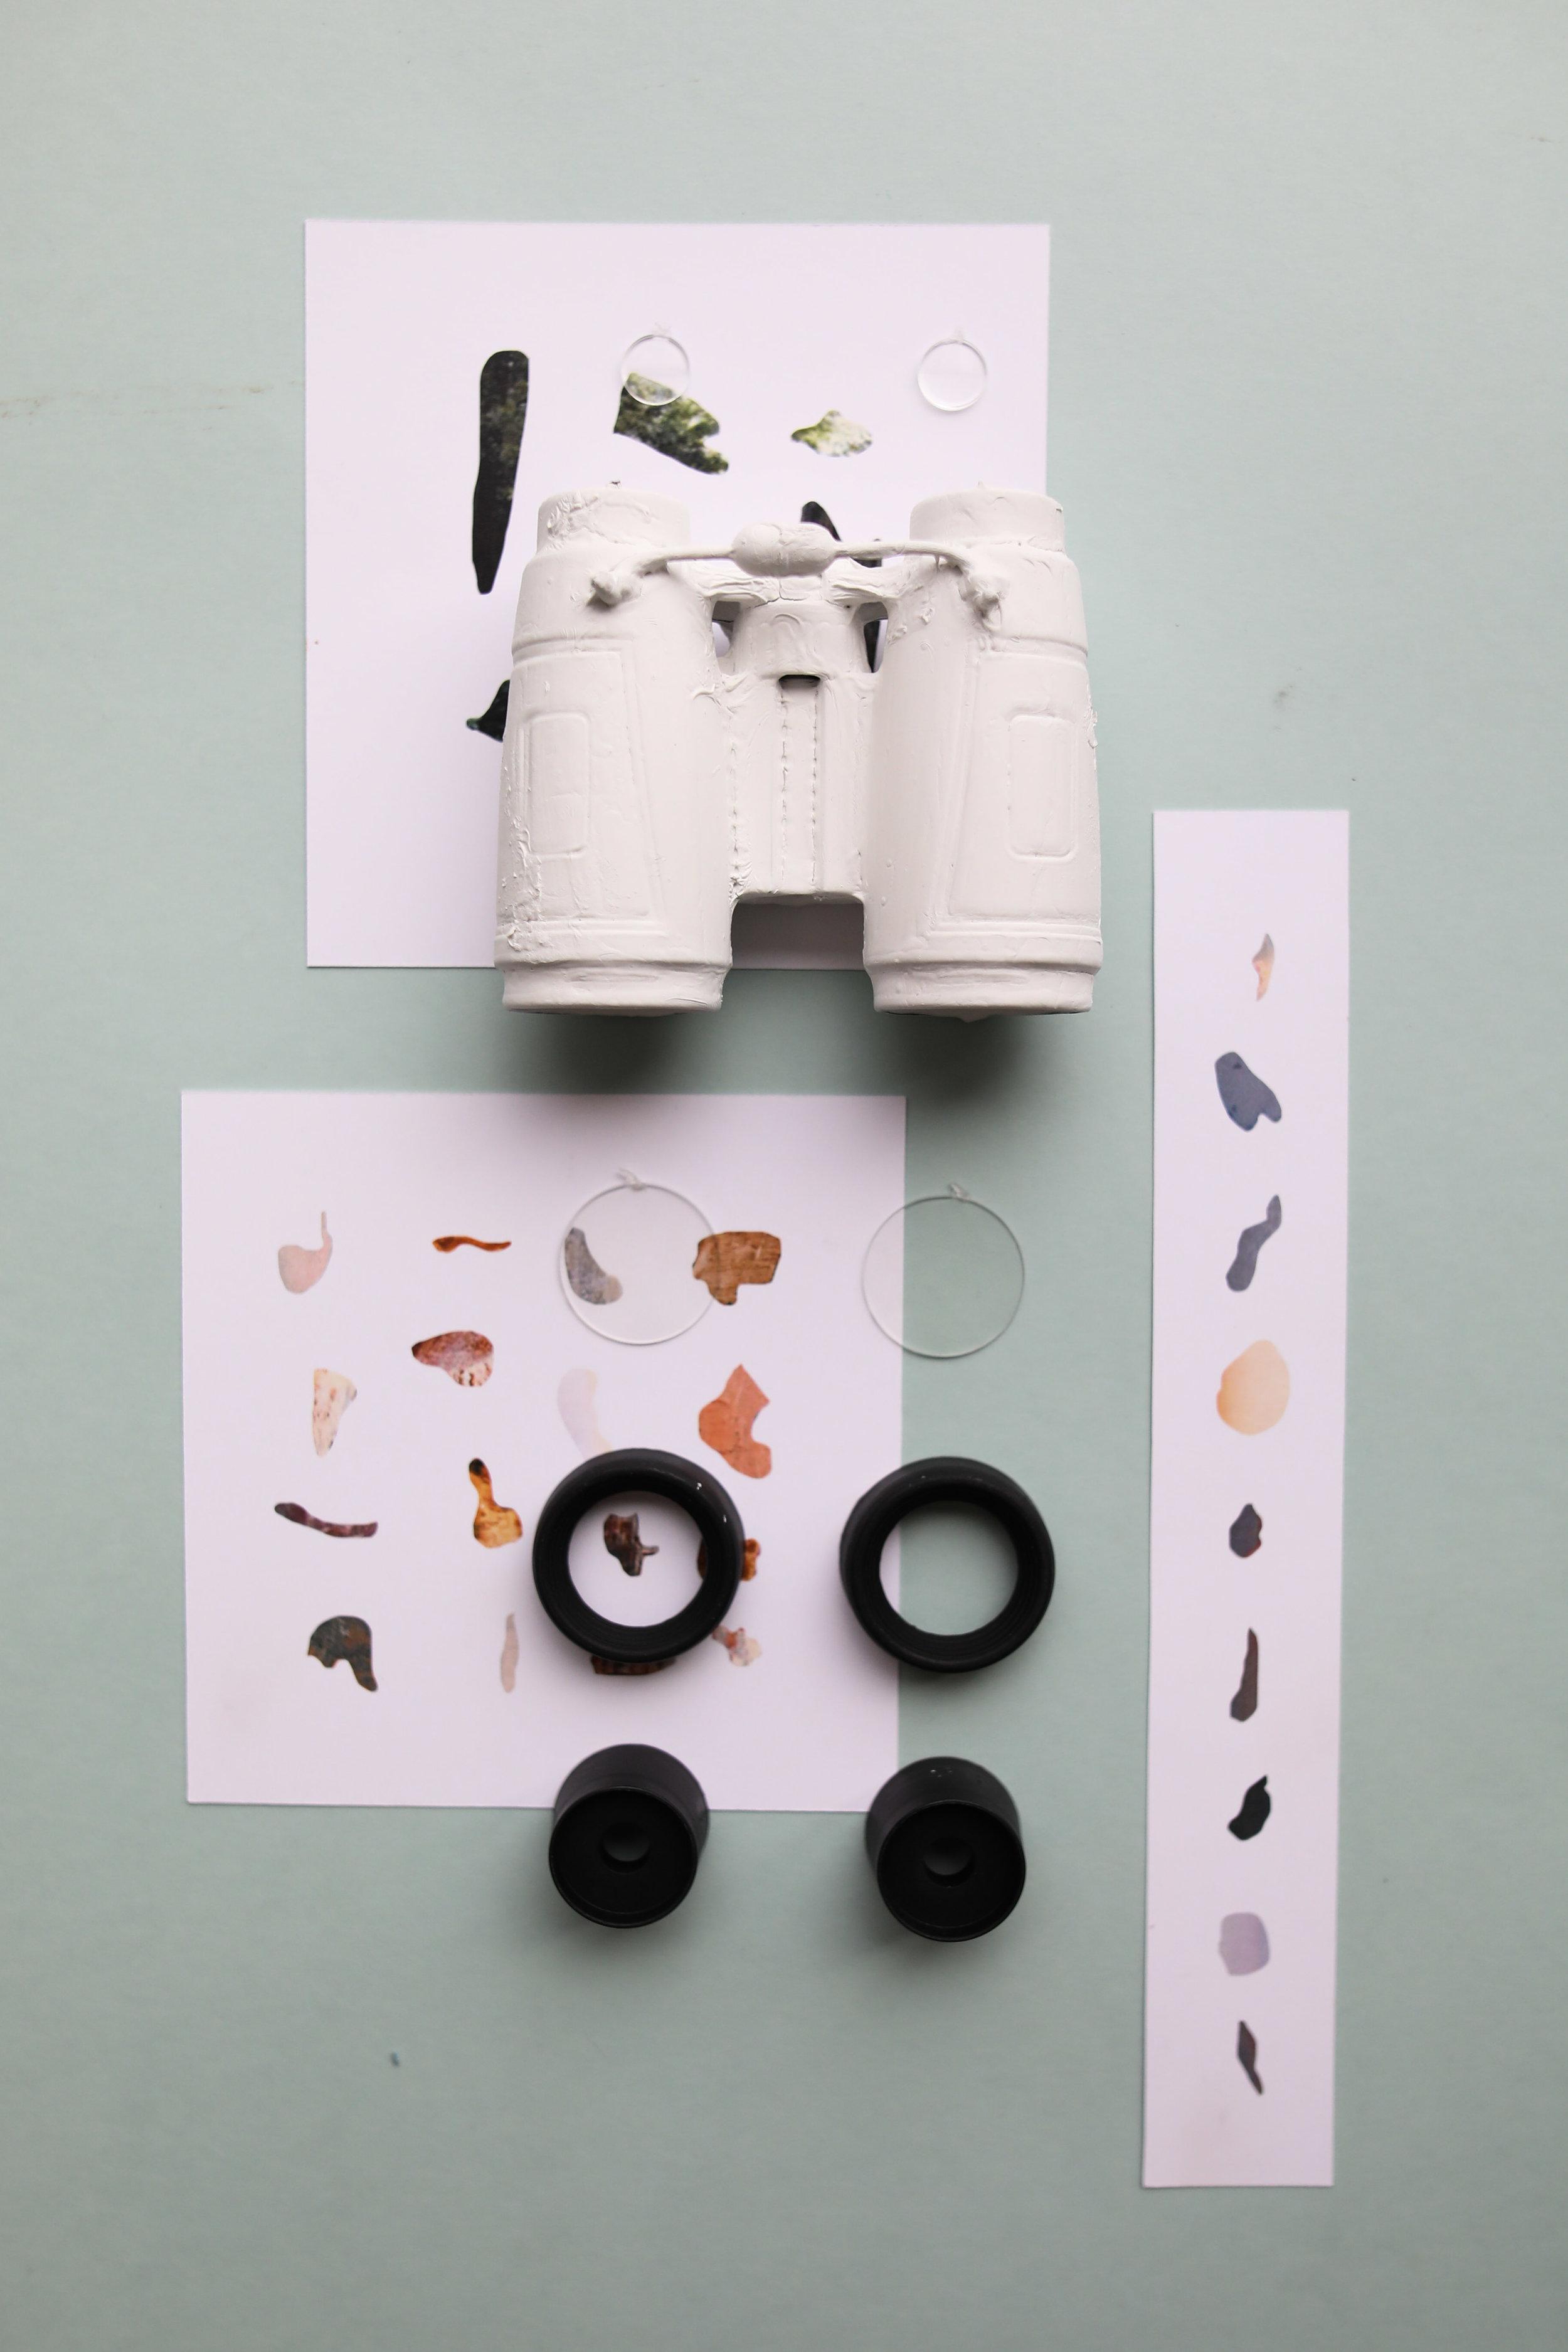 #BINCOUL_RS, 2017  Plastic Binoculars  Acrylic Paint  Paper